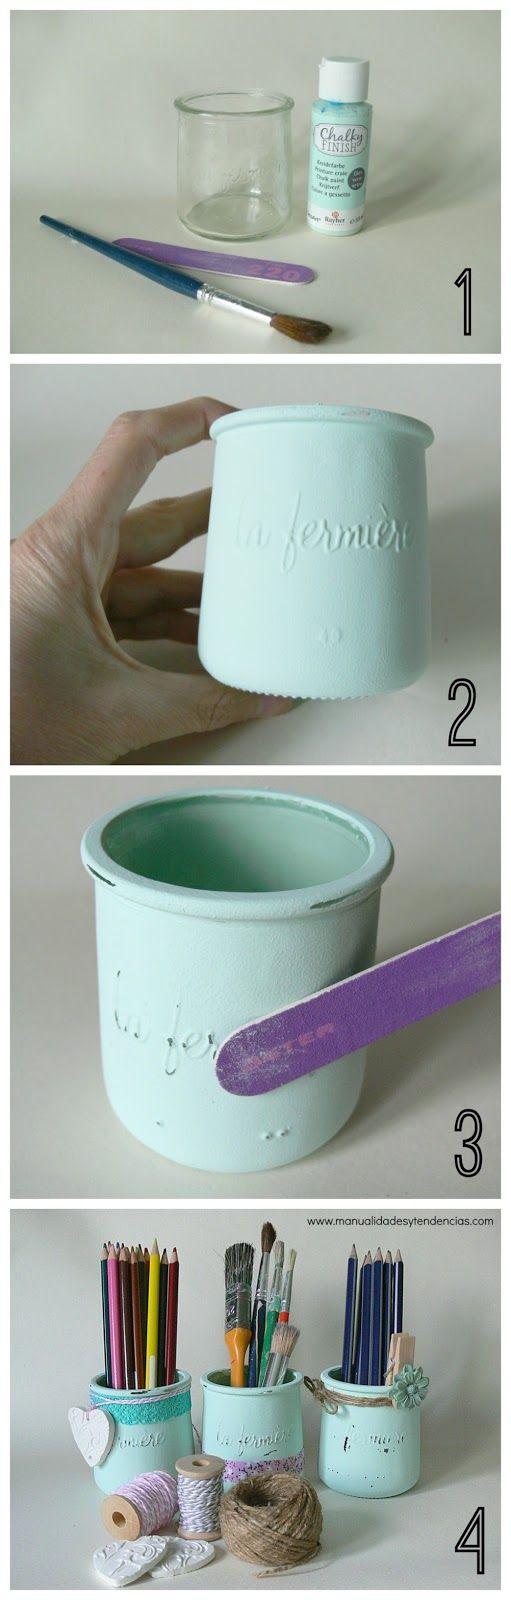 Chalk paint tarros de cristal shabby chic manualidades for Tarros de cristal vintage